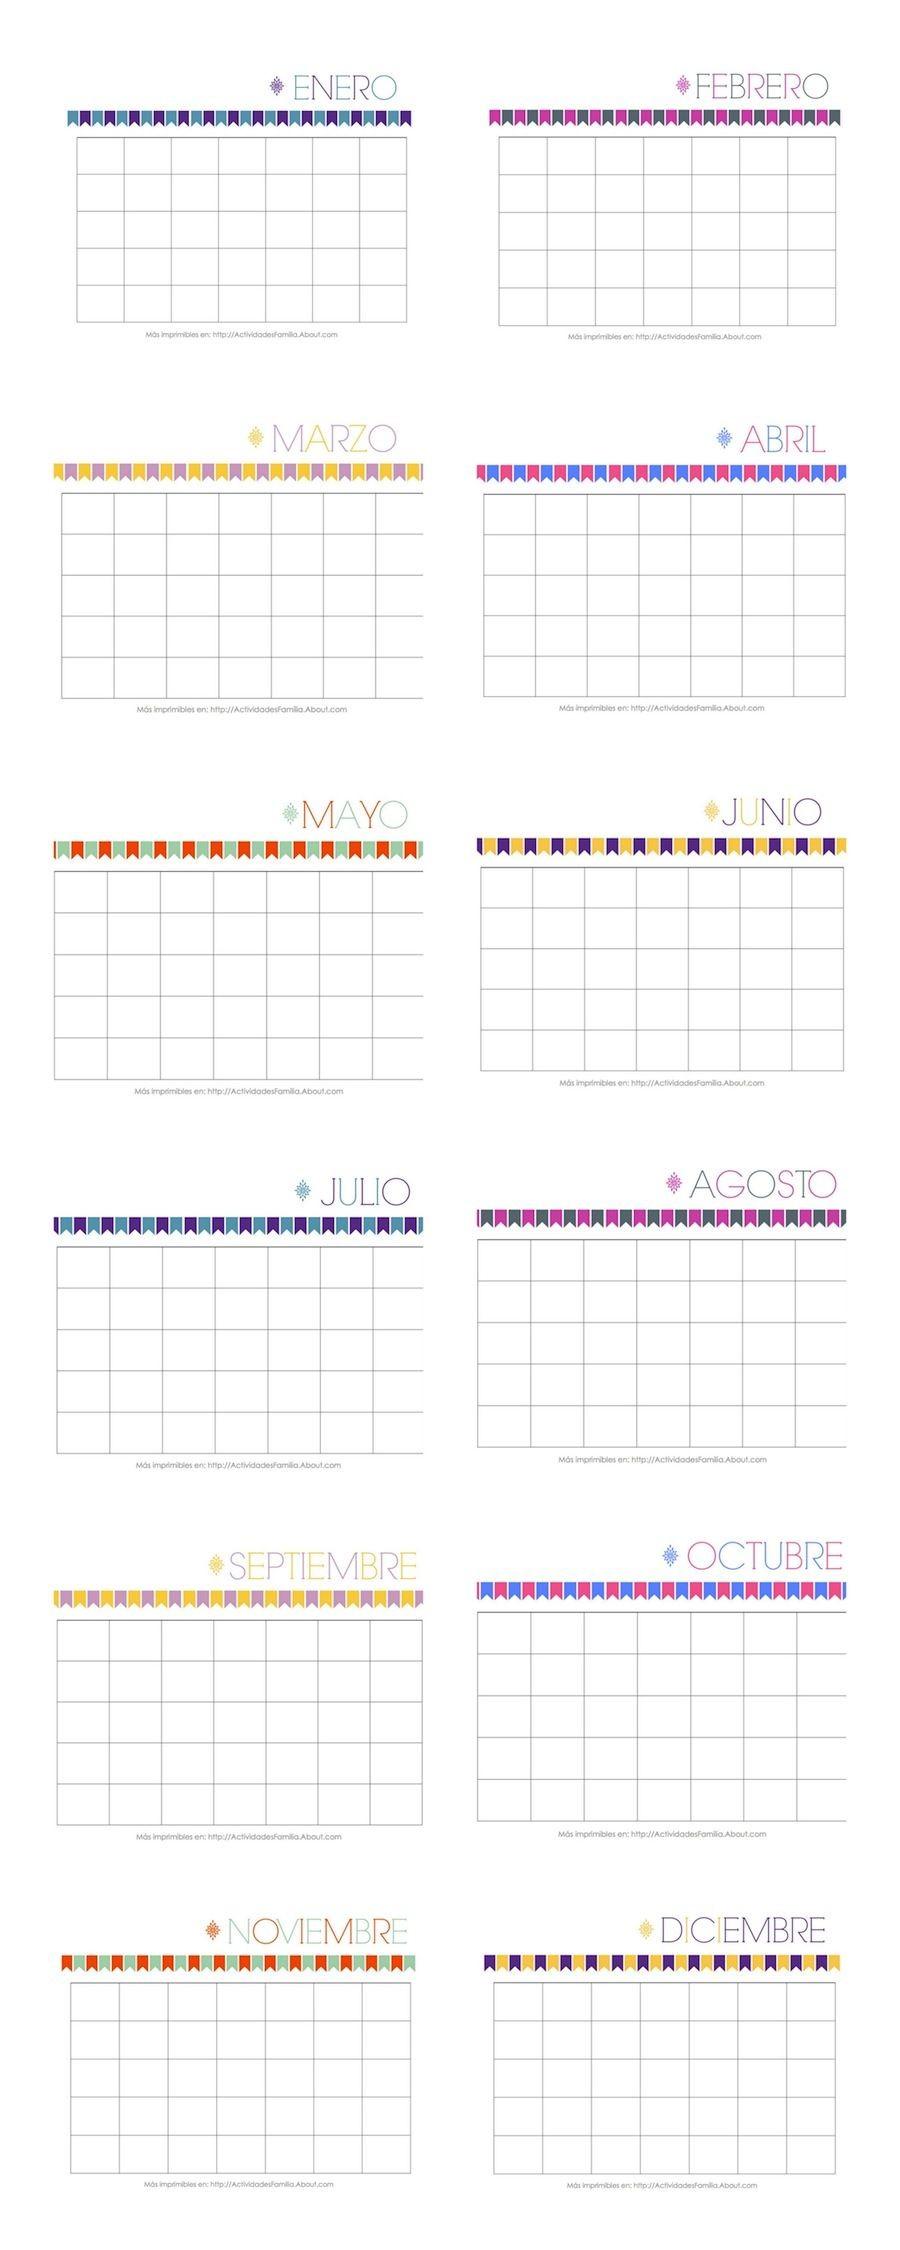 Imprimir Calendario Mes De Septiembre 2017 Mejores Y Más Novedosos Melani Melashi161 On Pinterest Of Imprimir Calendario Mes De Septiembre 2017 Más Arriba-a-fecha Pin De Calendario Hispano En Calendario Lunar A±o 2019